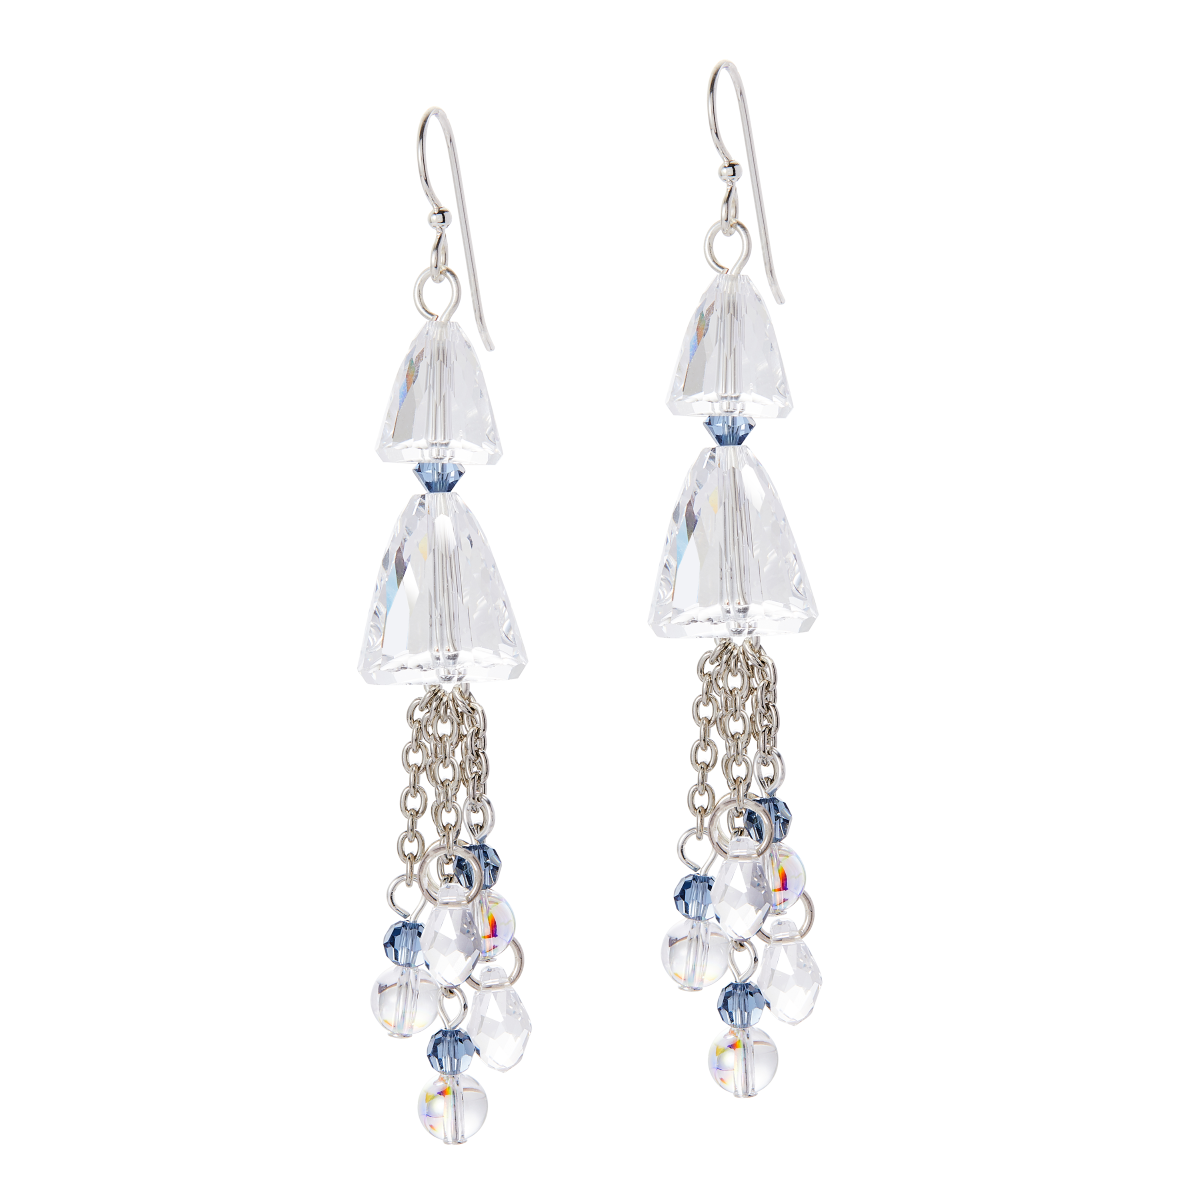 austria-earrings-1200px.png